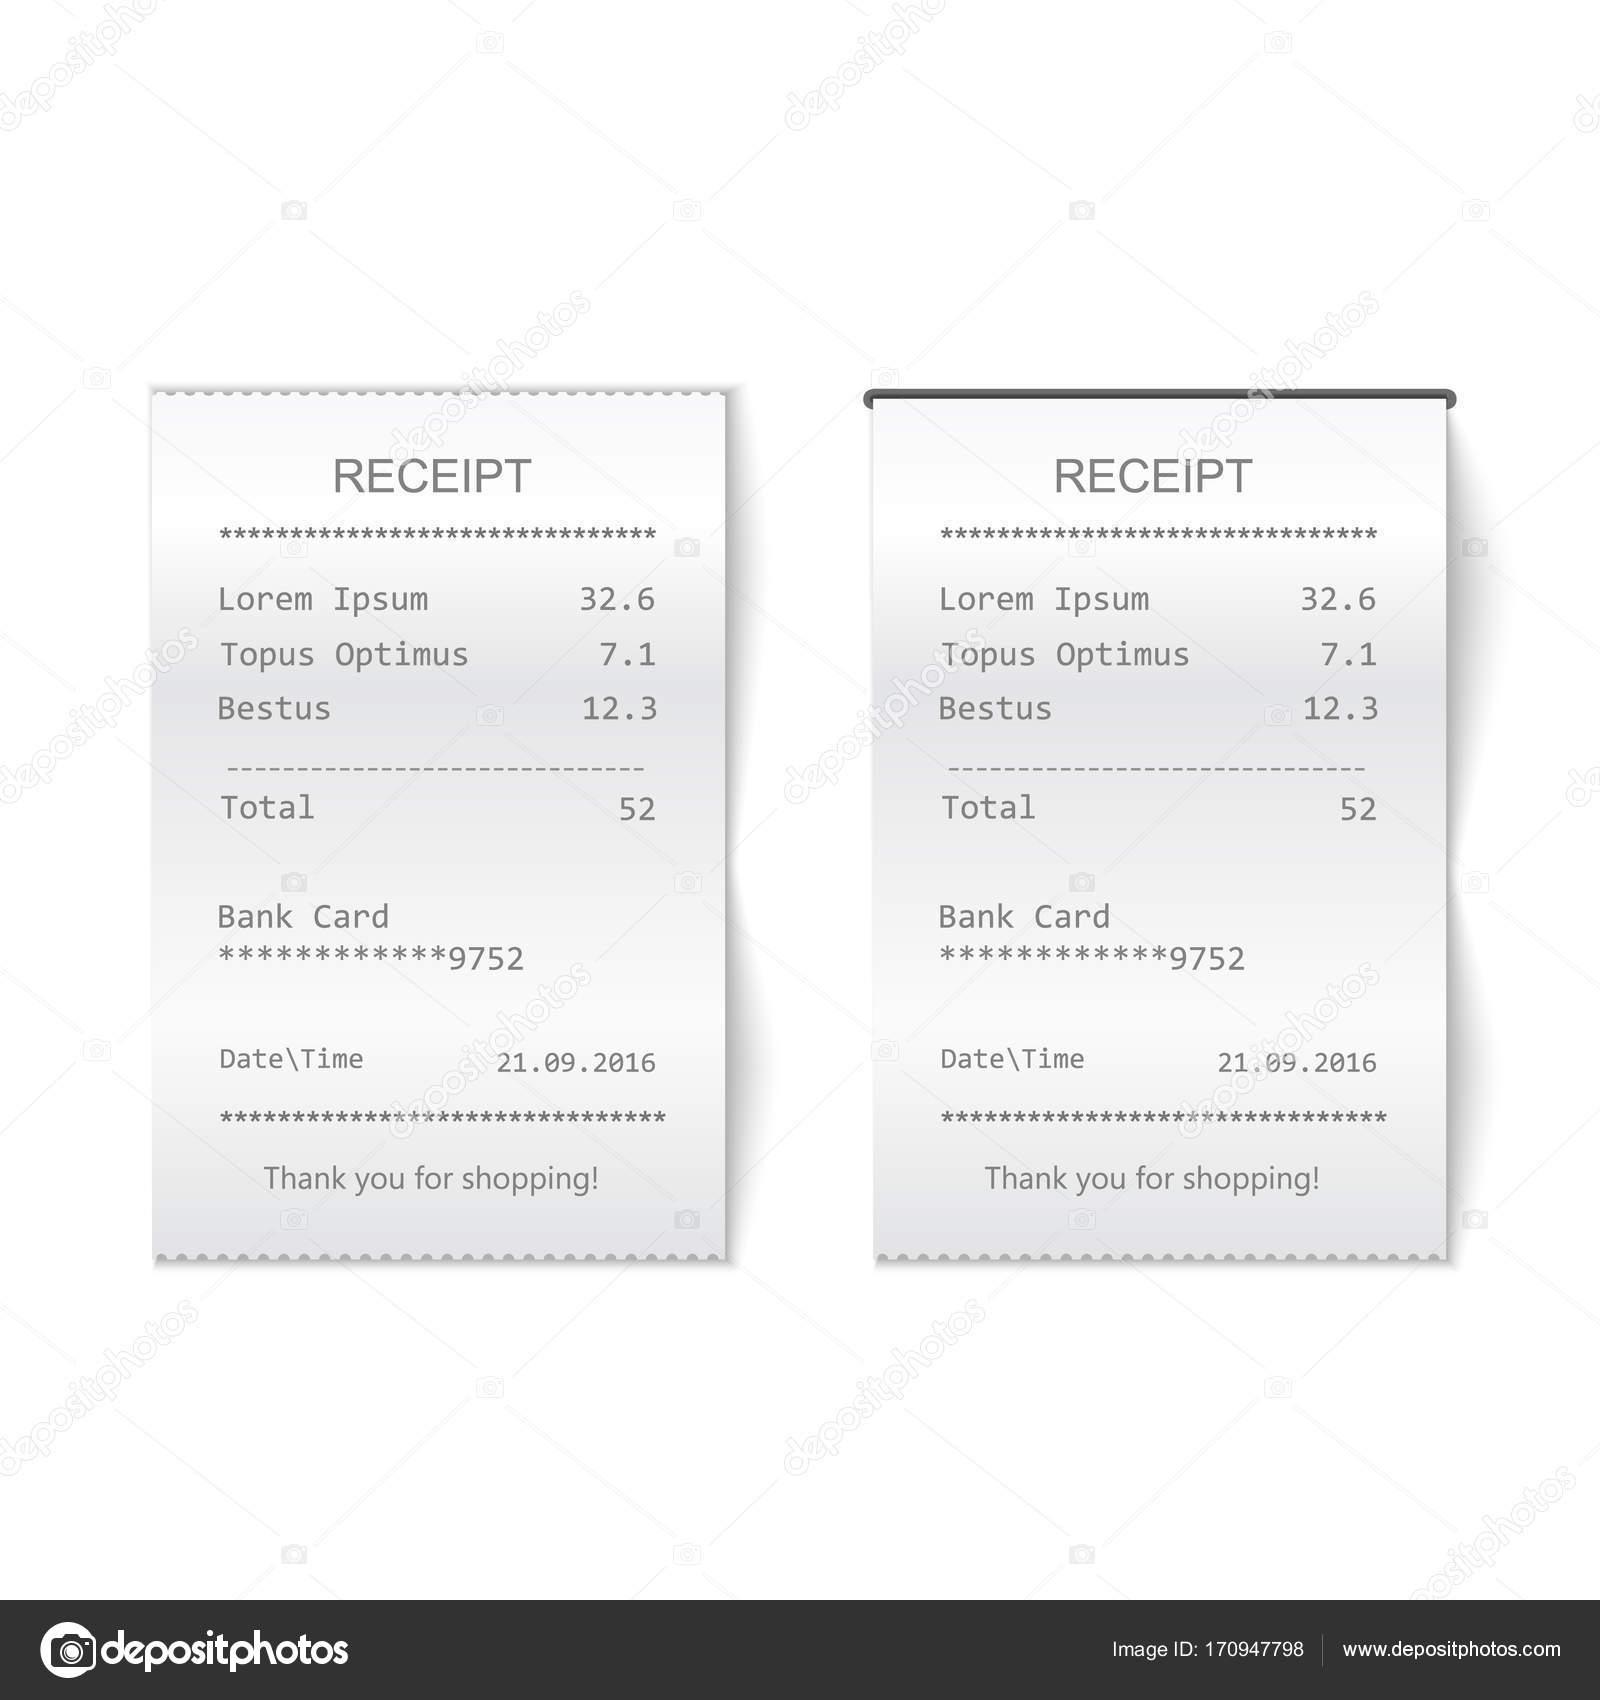 Gedruckte Rechnung. Bill-atm-check — Stockfoto © Lightkite #170947798